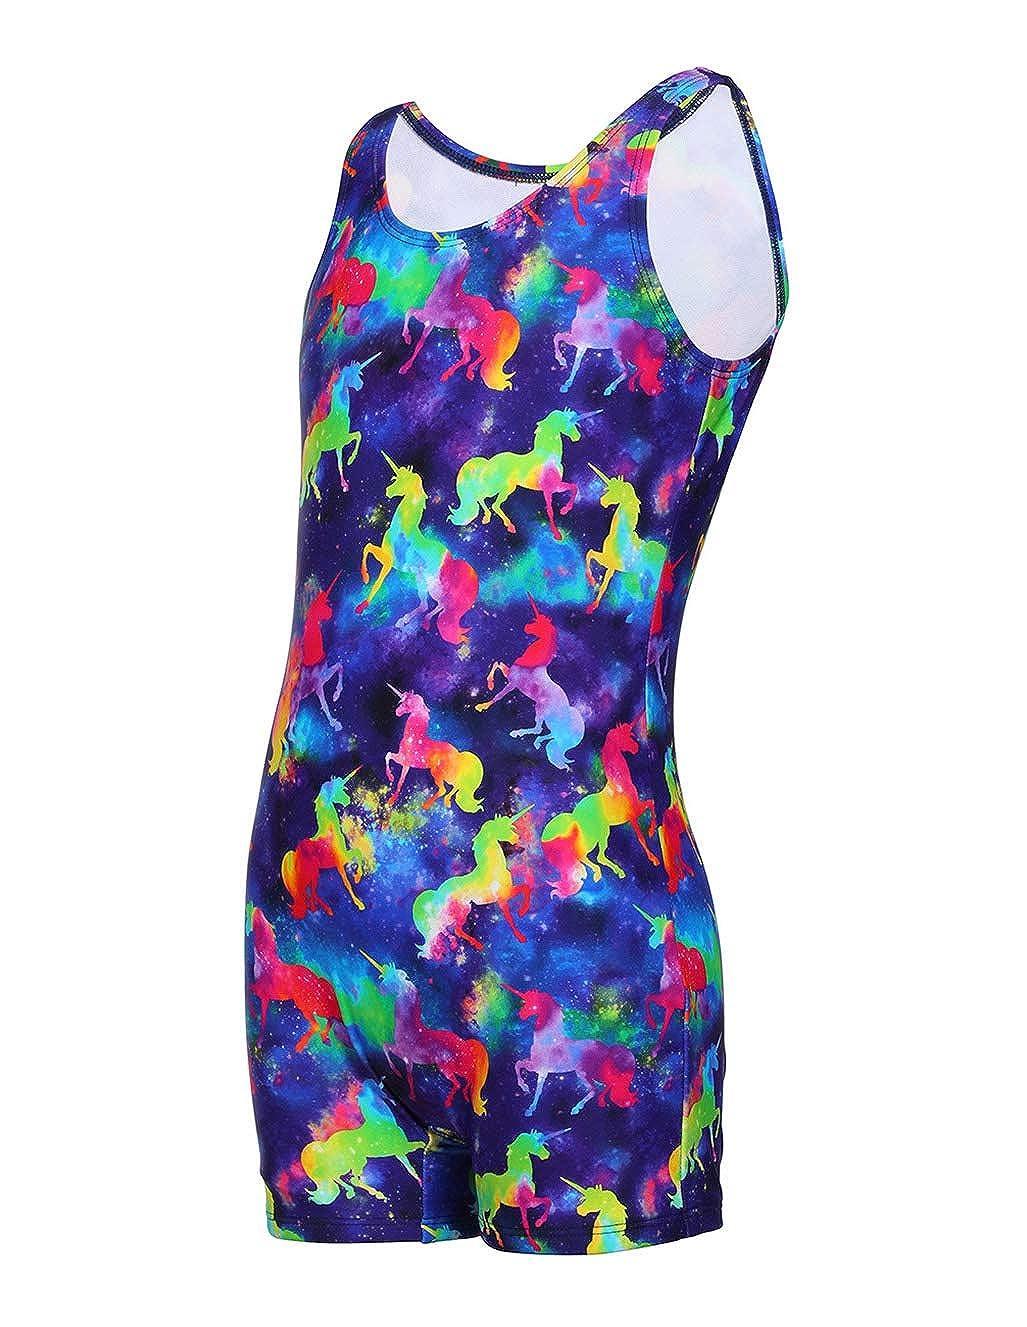 Size 4-16 LEINASEN Racer Back Girls Rainbow One Piece Swimsuits